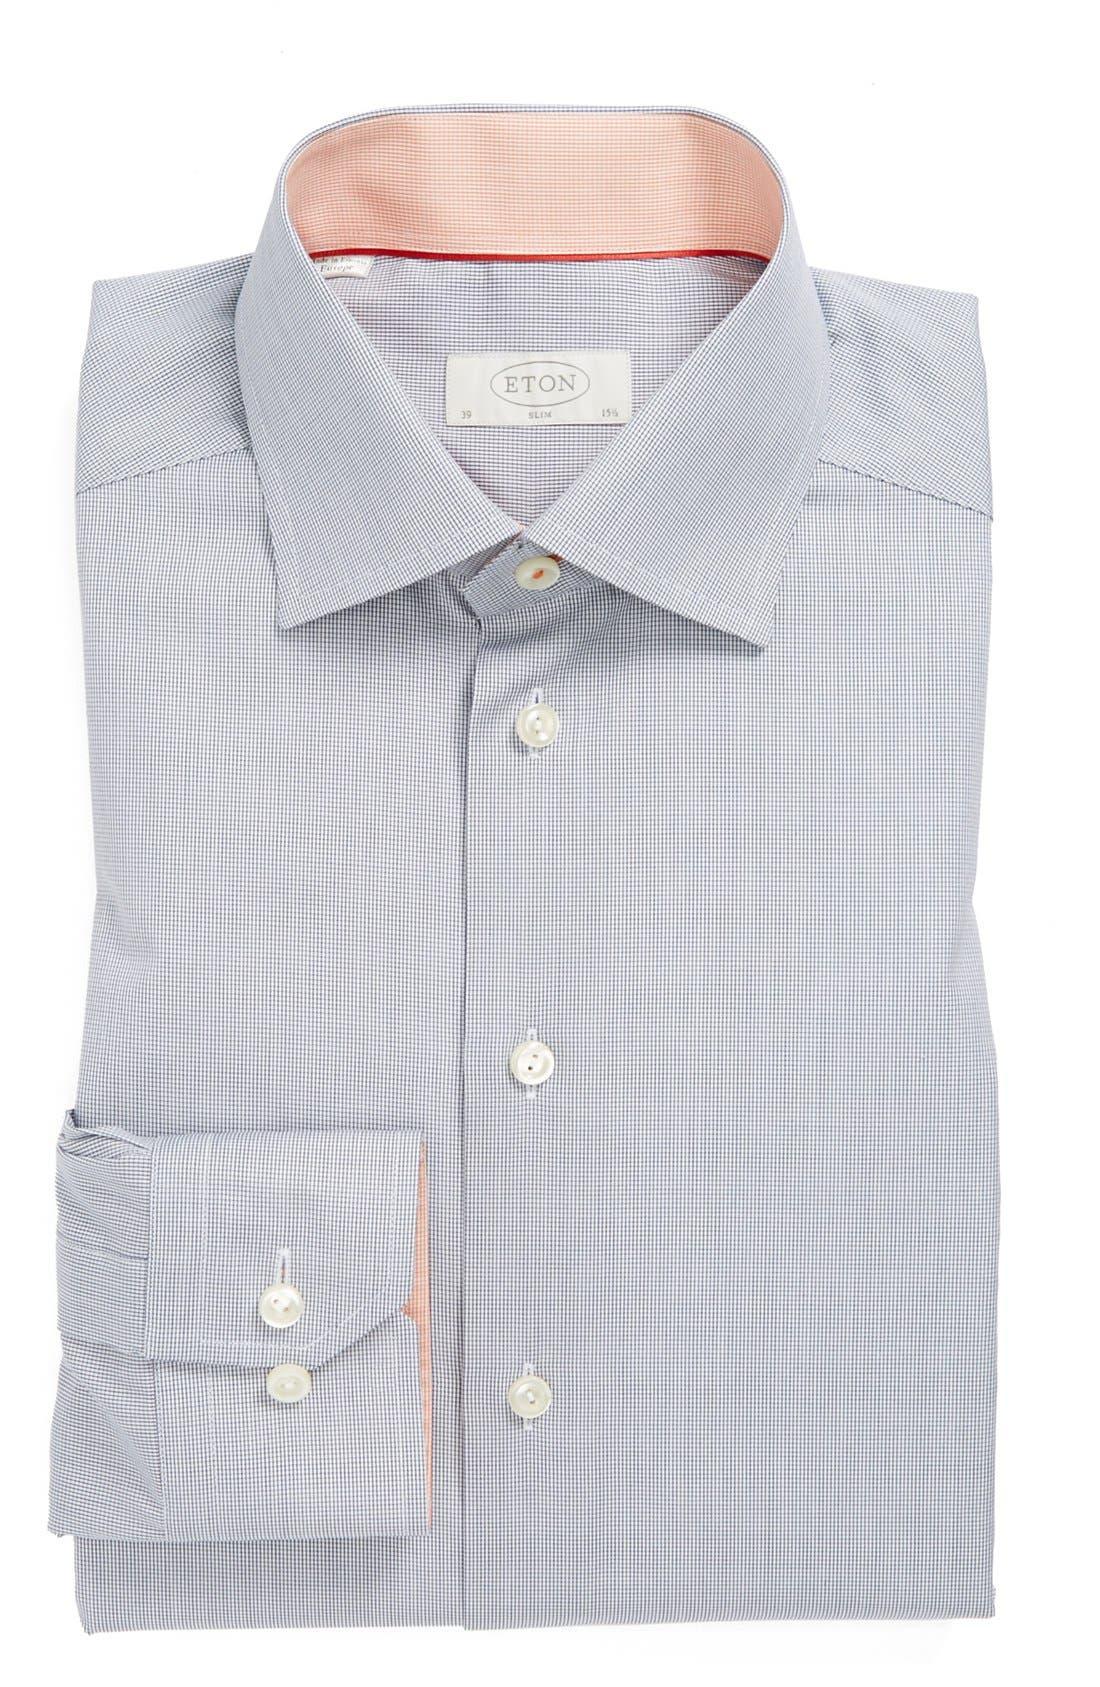 Main Image - Eton Slim Fit Non-Iron Dress Shirt